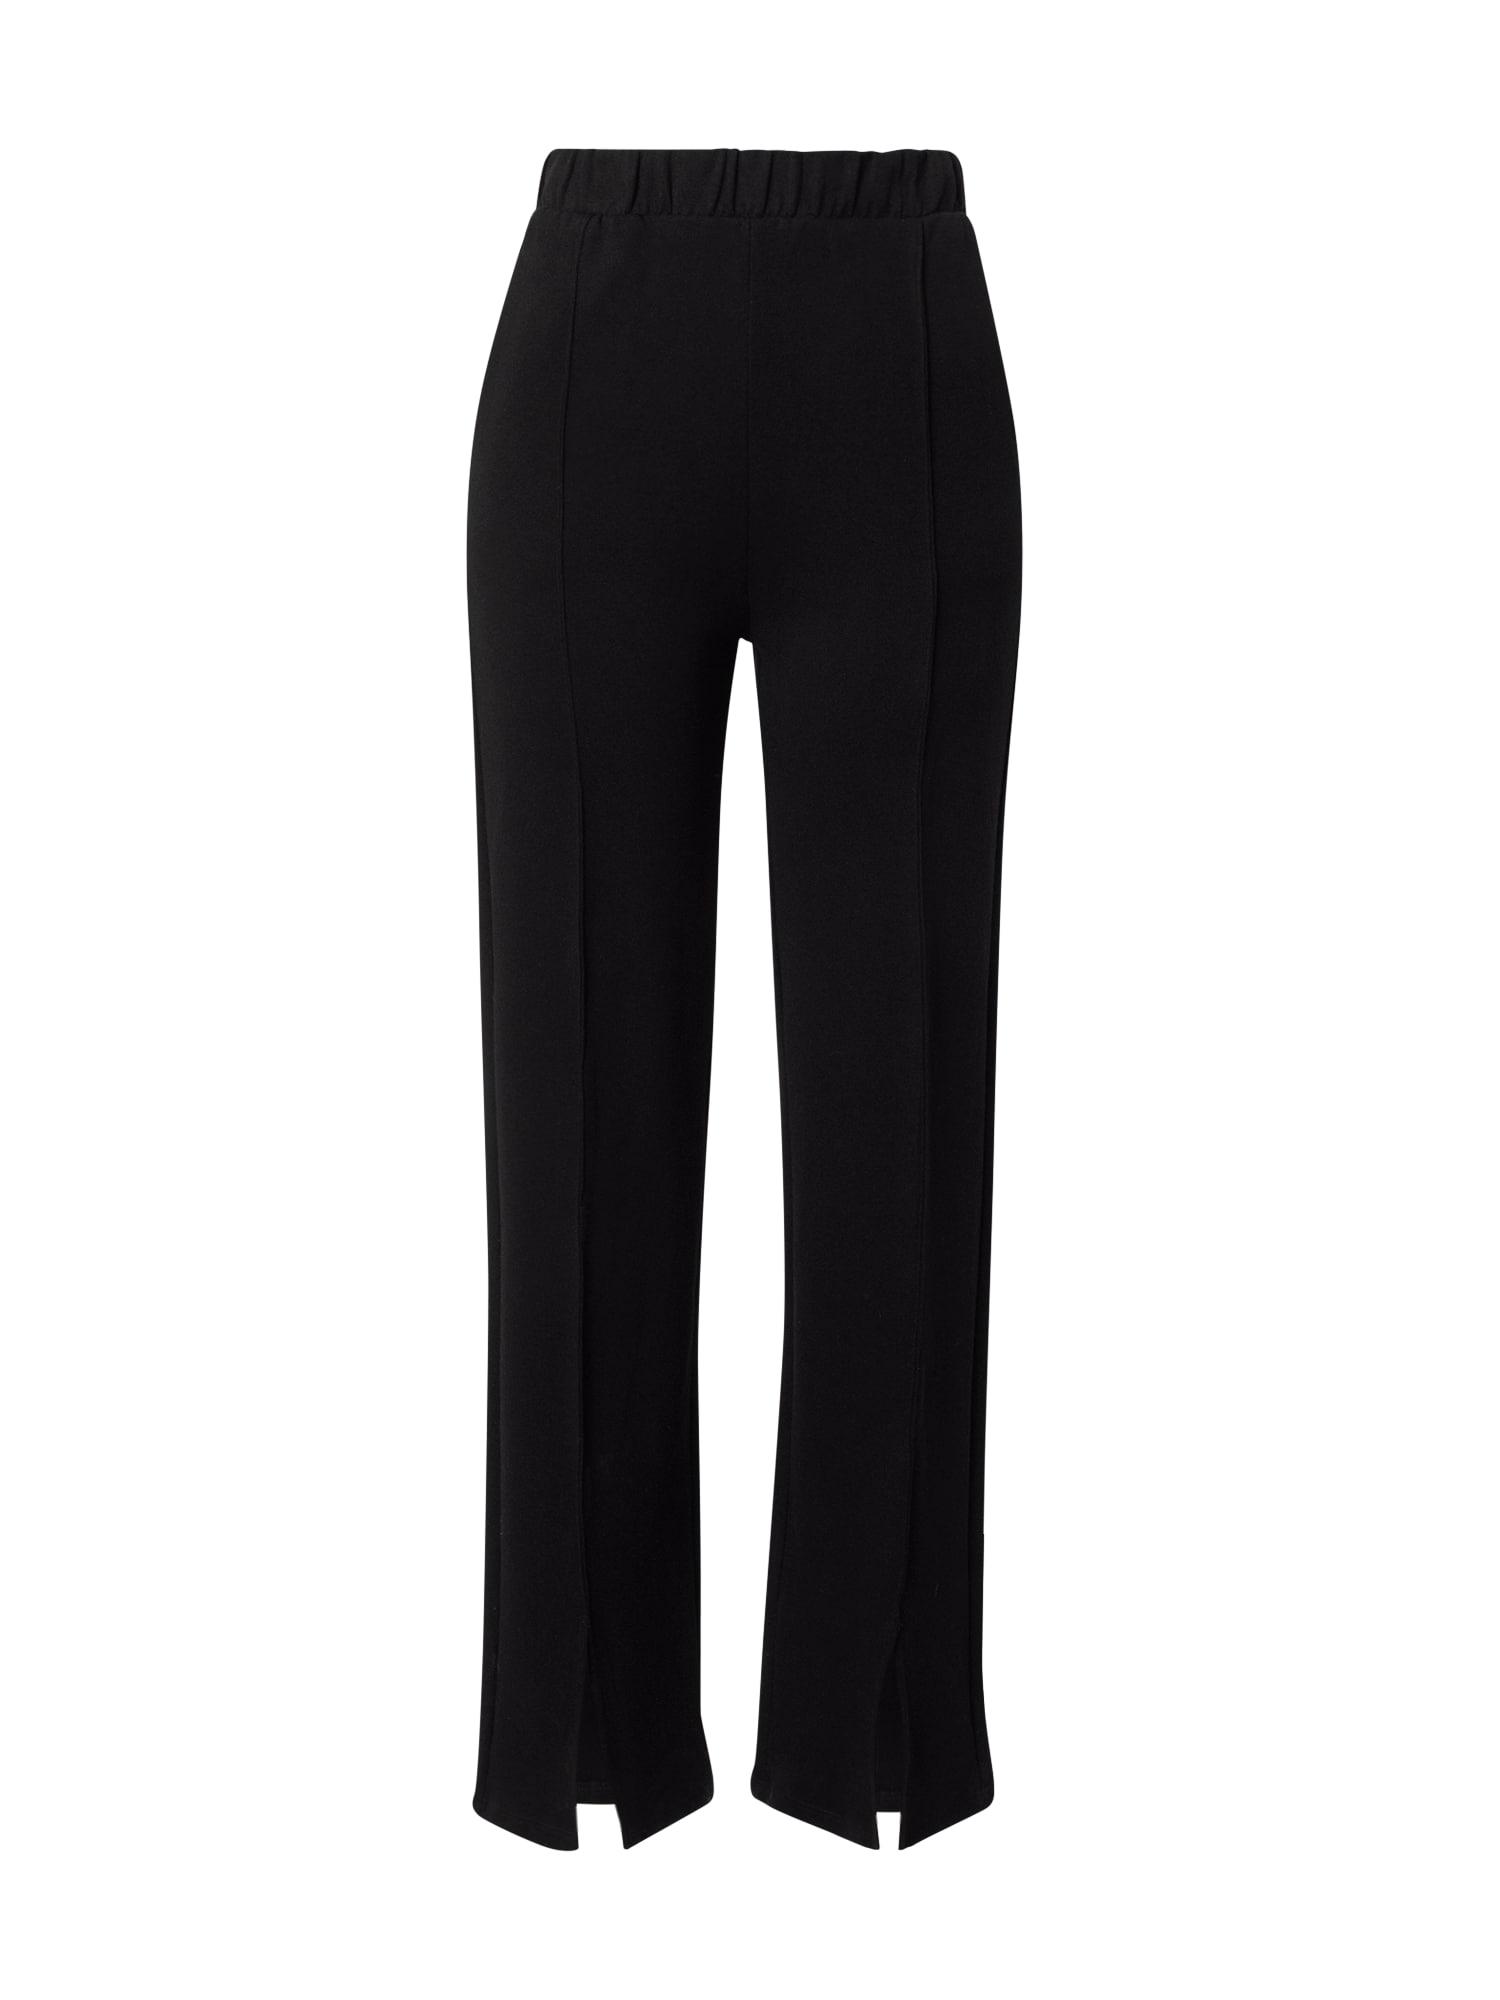 Gina Tricot Kelnės 'Klara' juoda